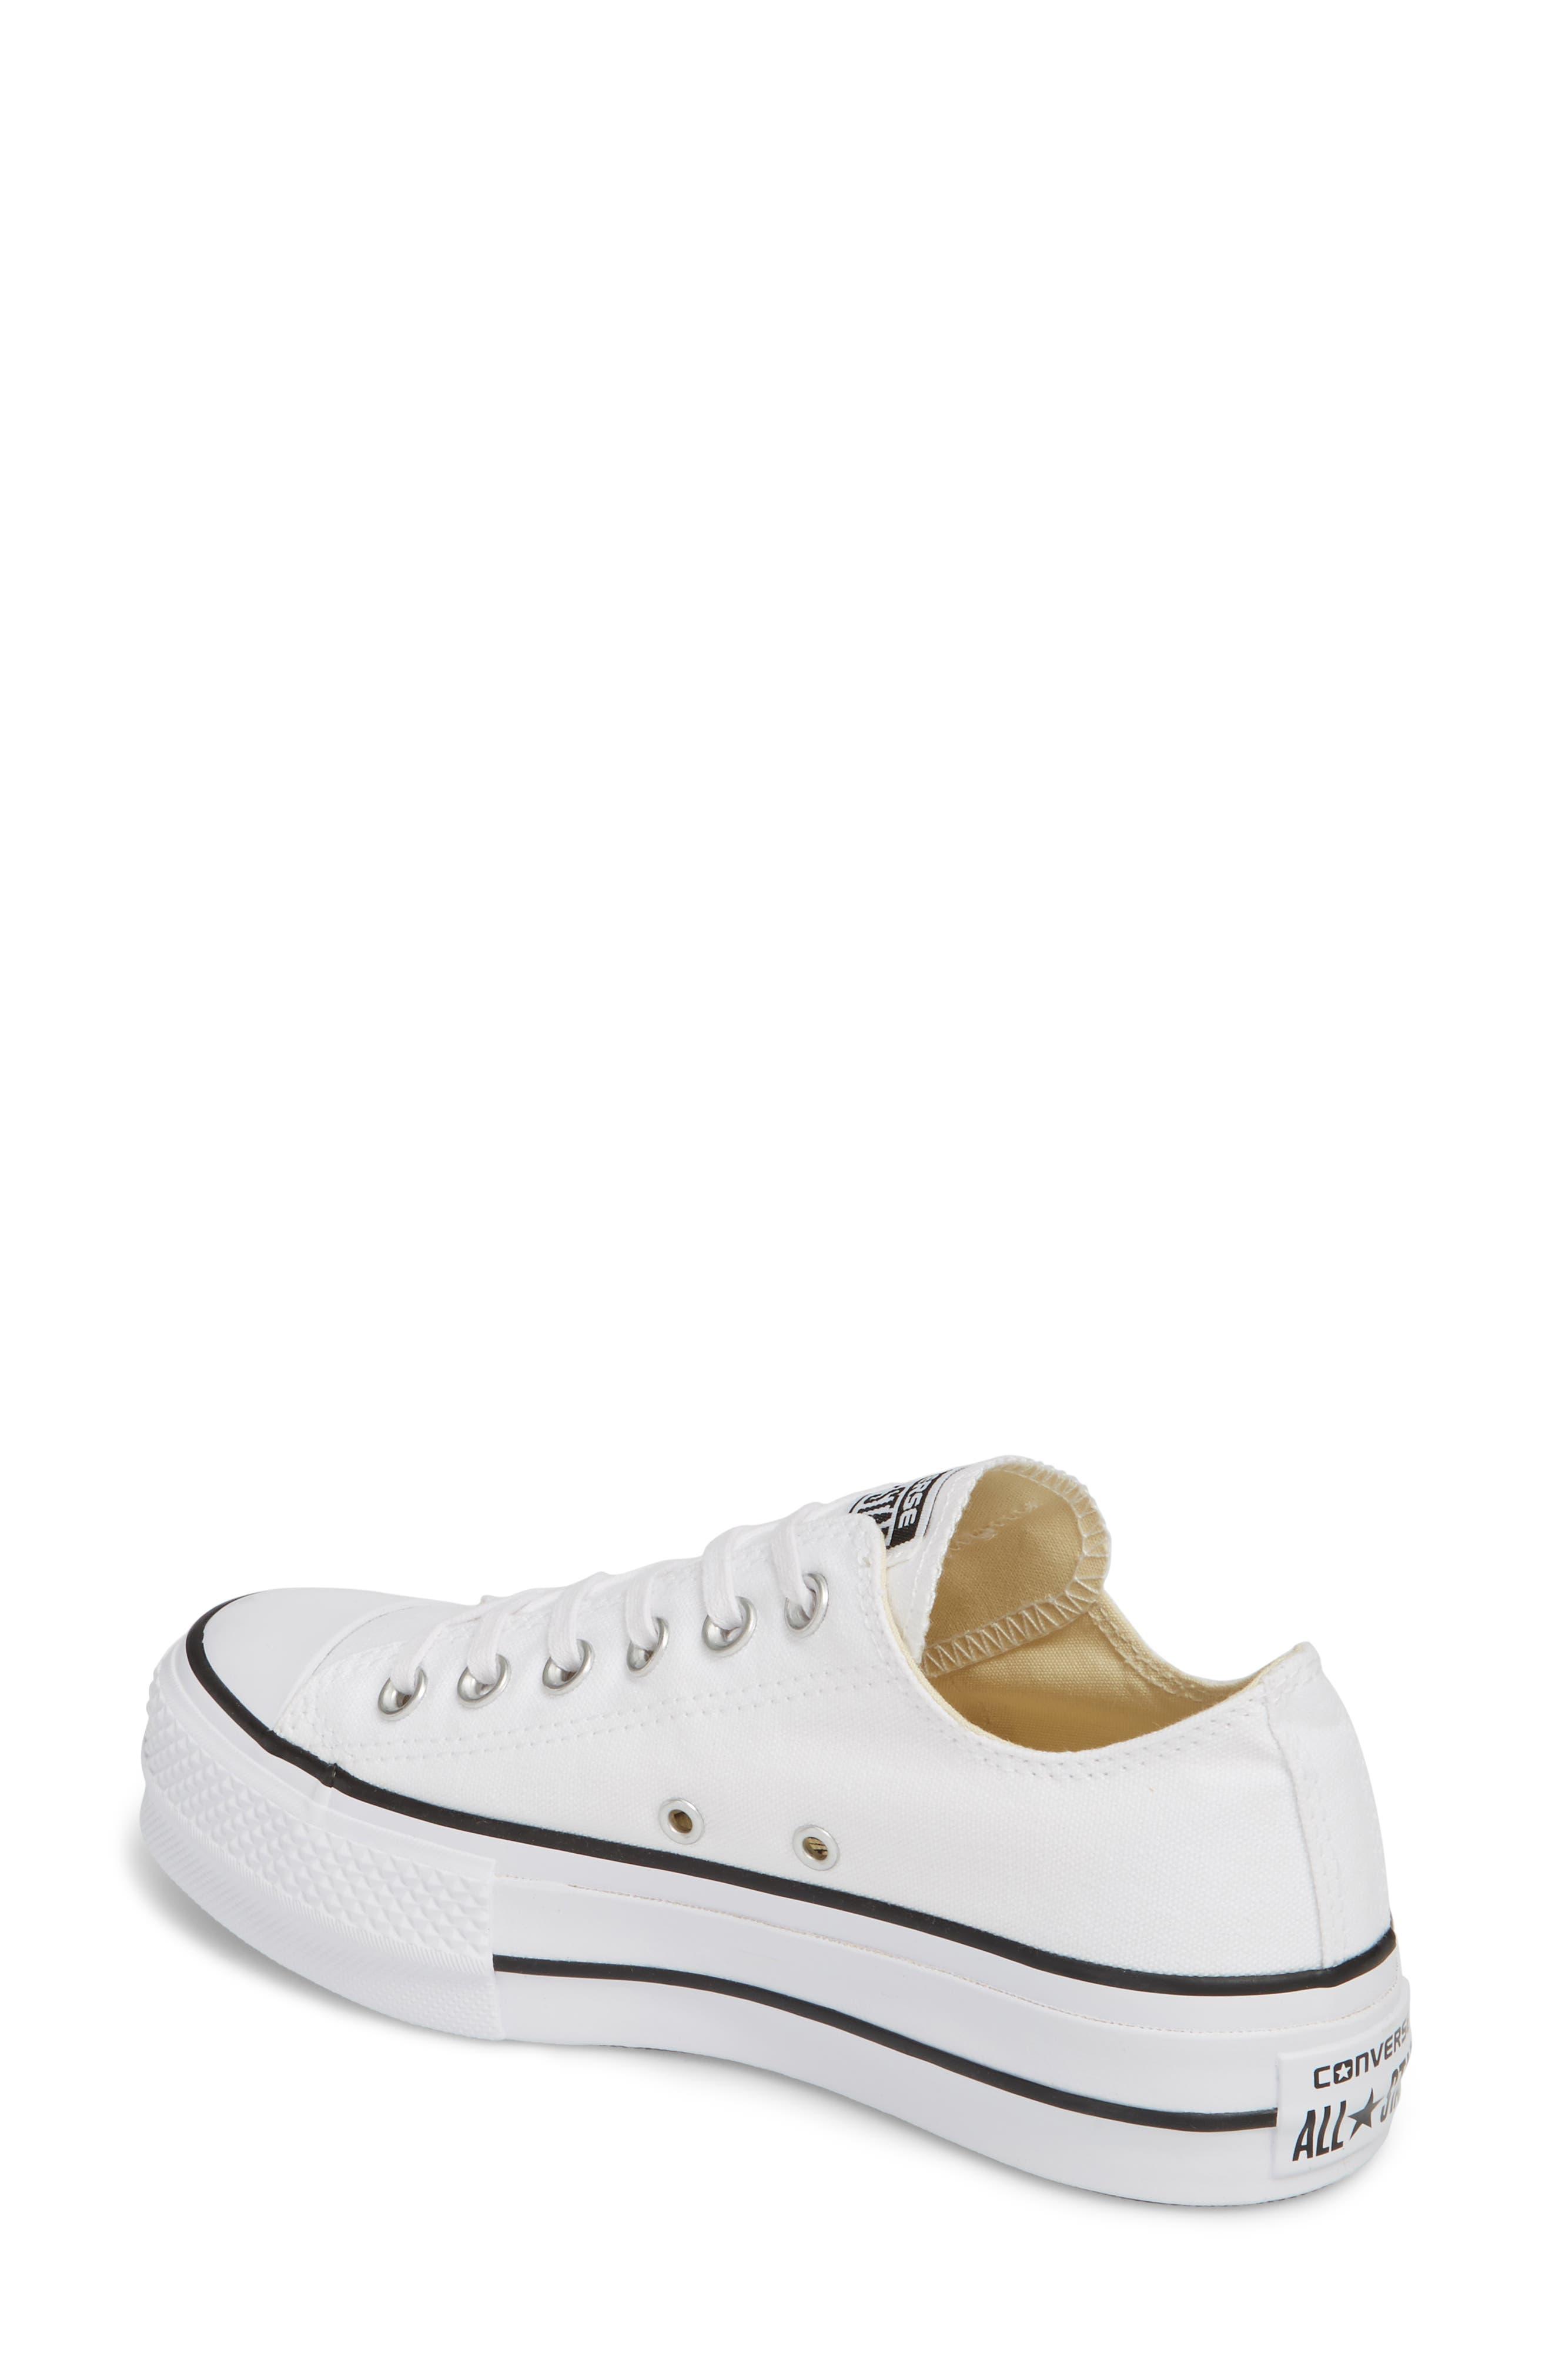 Chuck Taylor<sup>®</sup> All Star<sup>®</sup> Platform Sneaker,                             Alternate thumbnail 2, color,                             White/ Black/ White